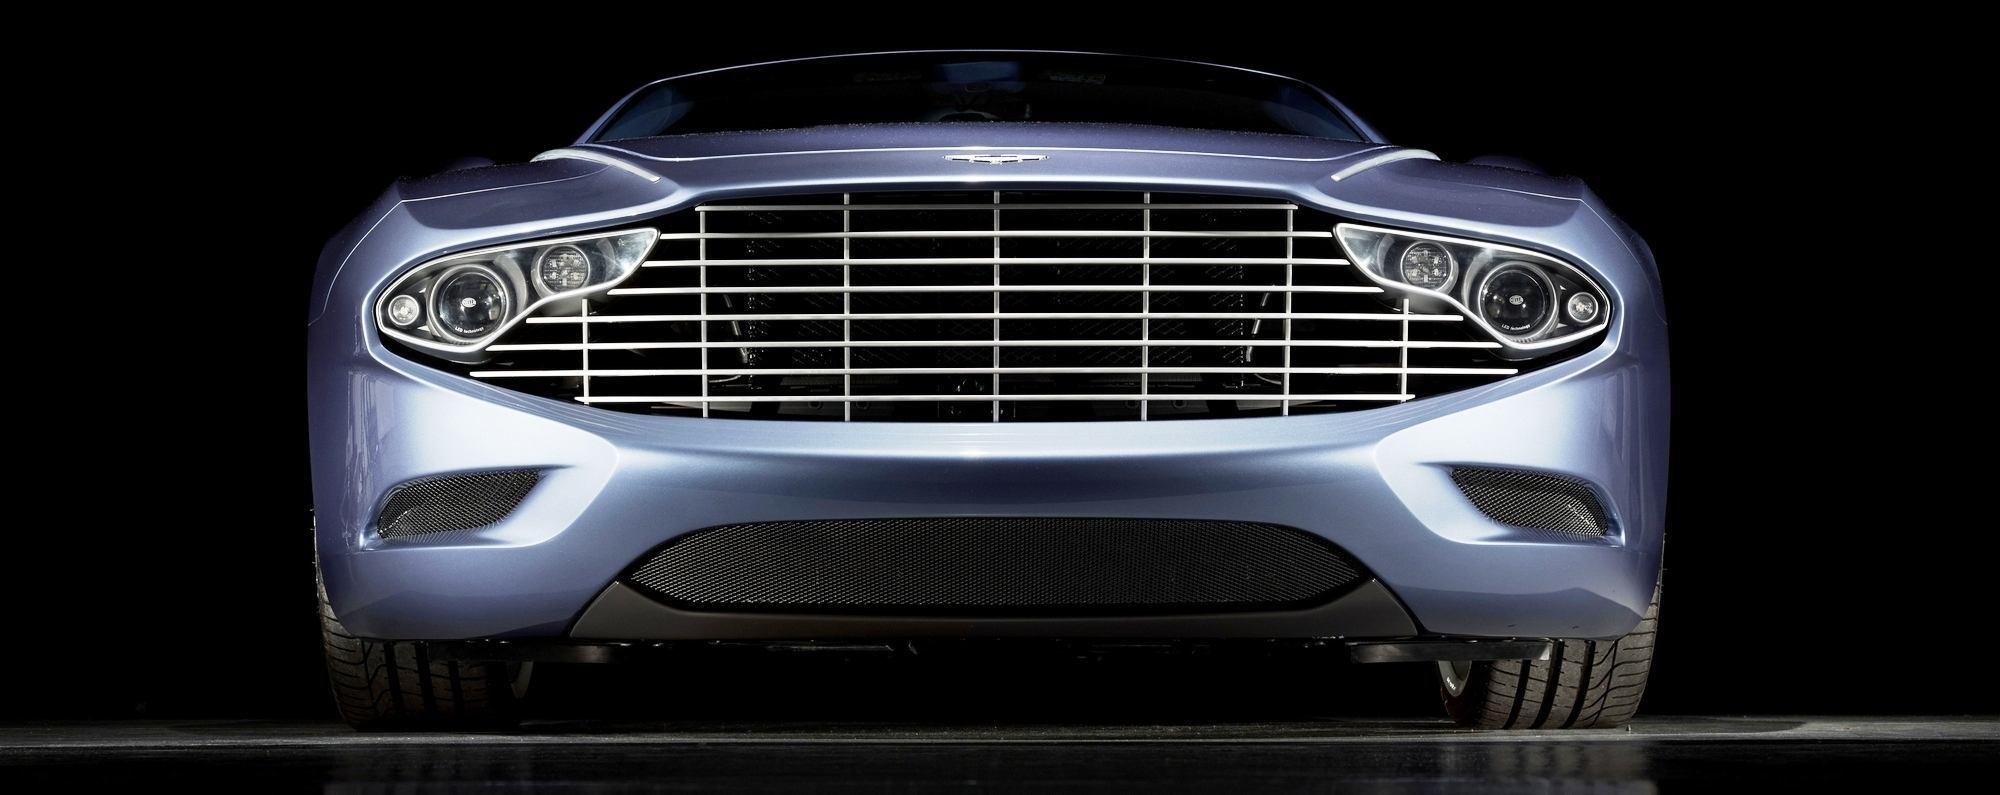 Block Chic Zagato Aston Martin Dbs Centennial Hits